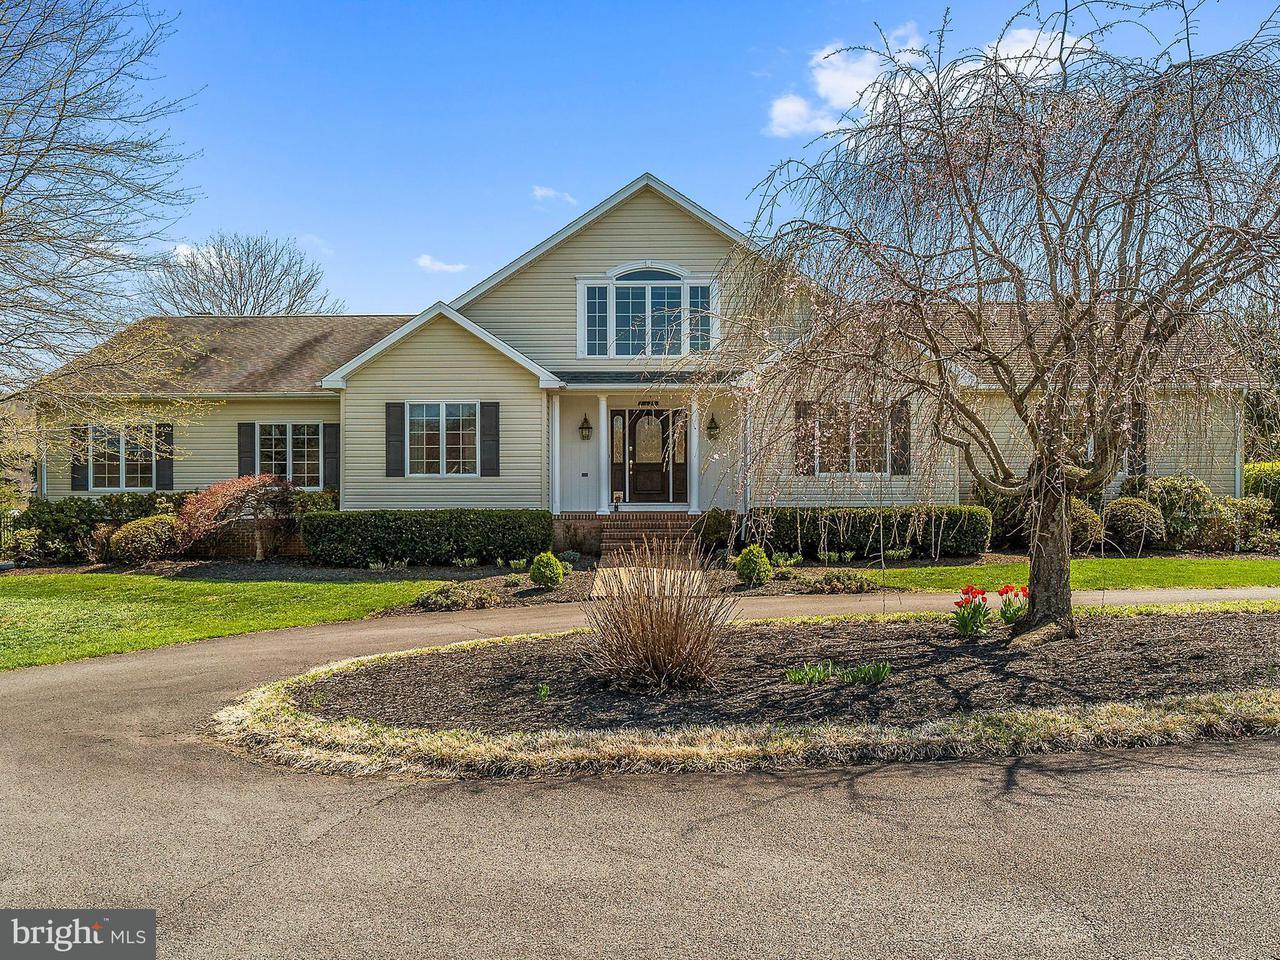 独户住宅 为 销售 在 64 Rolling Green Lane 64 Rolling Green Lane Brightwood, 弗吉尼亚州 22715 美国